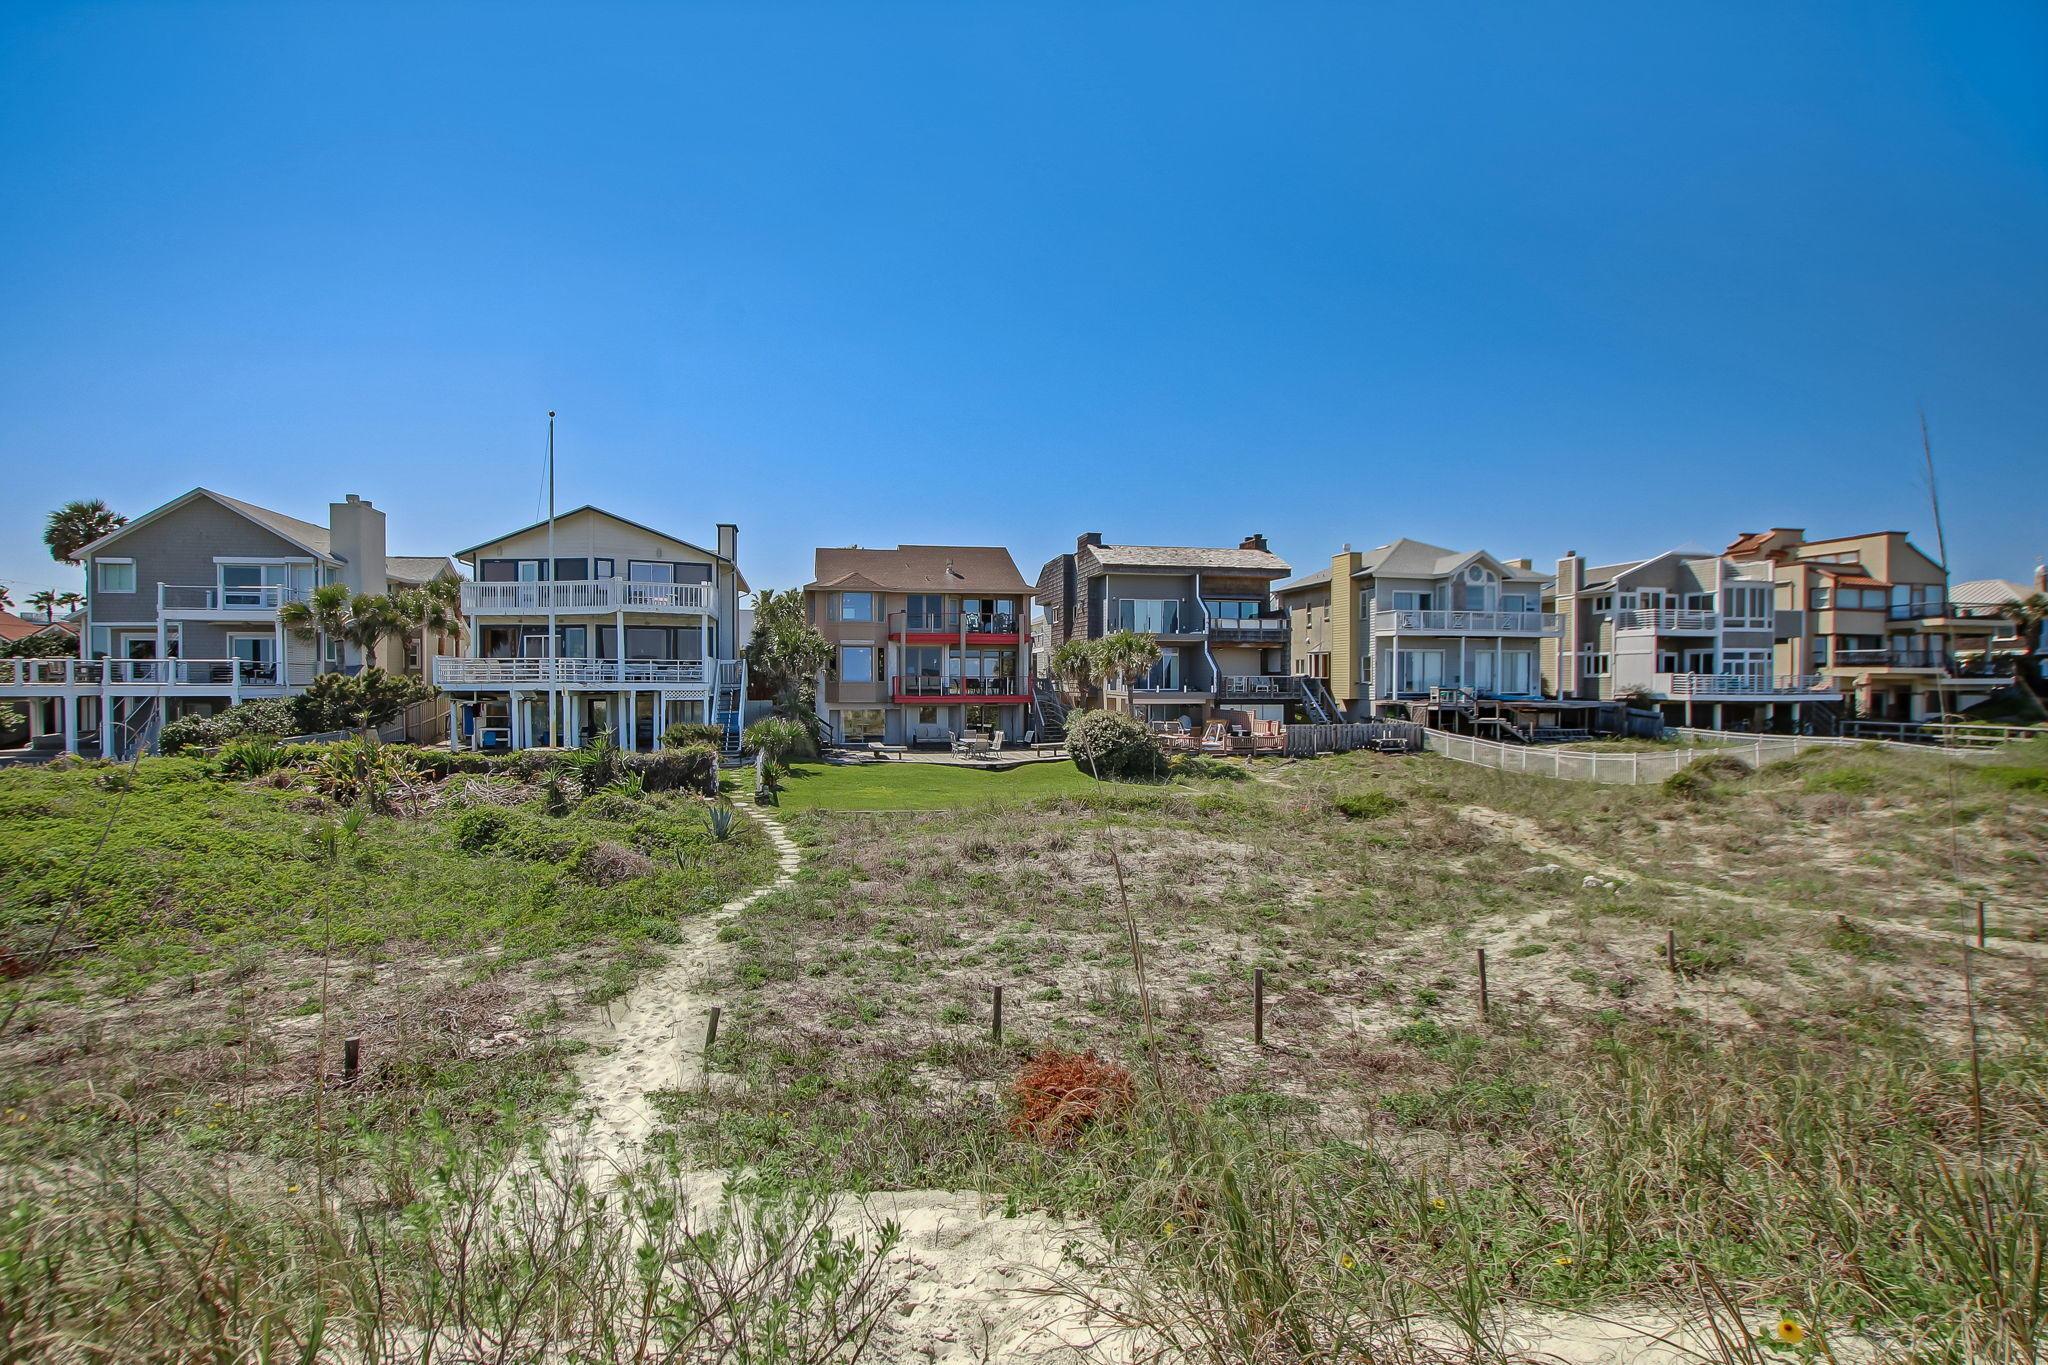 1881 BEACH, ATLANTIC BEACH, FLORIDA 32233, 5 Bedrooms Bedrooms, ,4 BathroomsBathrooms,Residential,For sale,BEACH,1102839